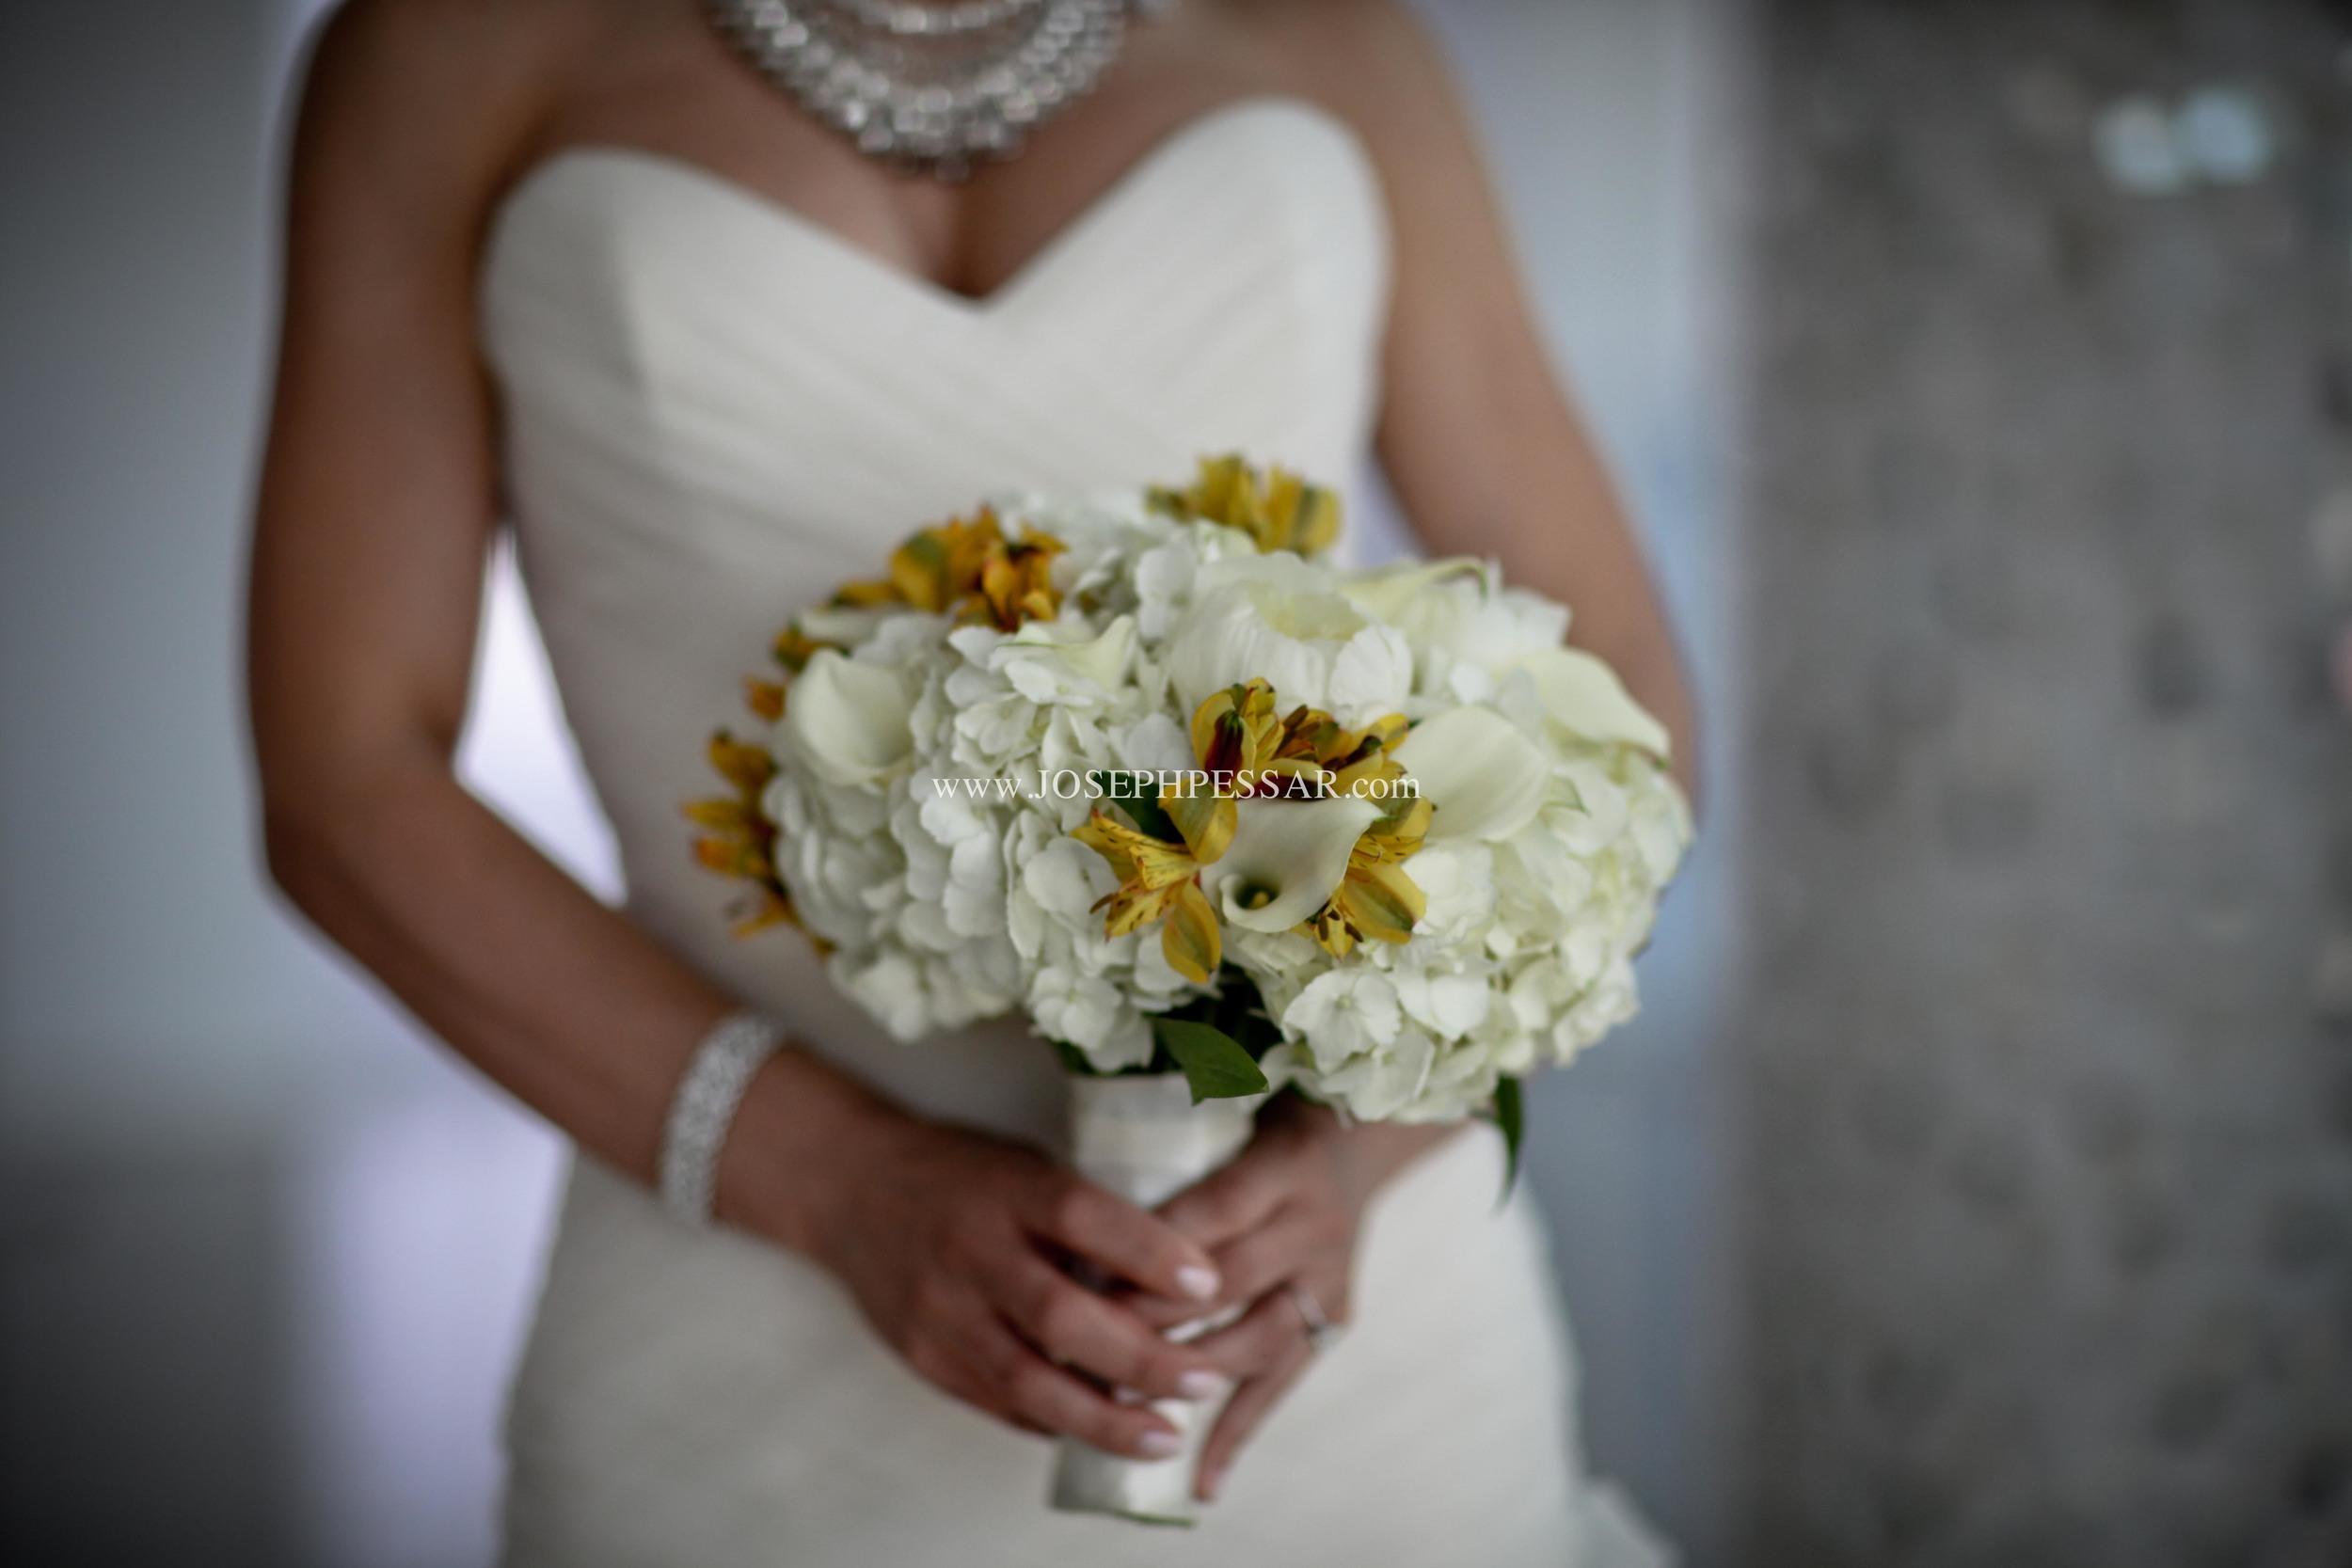 nyc_wedding_photographer0013.jpg